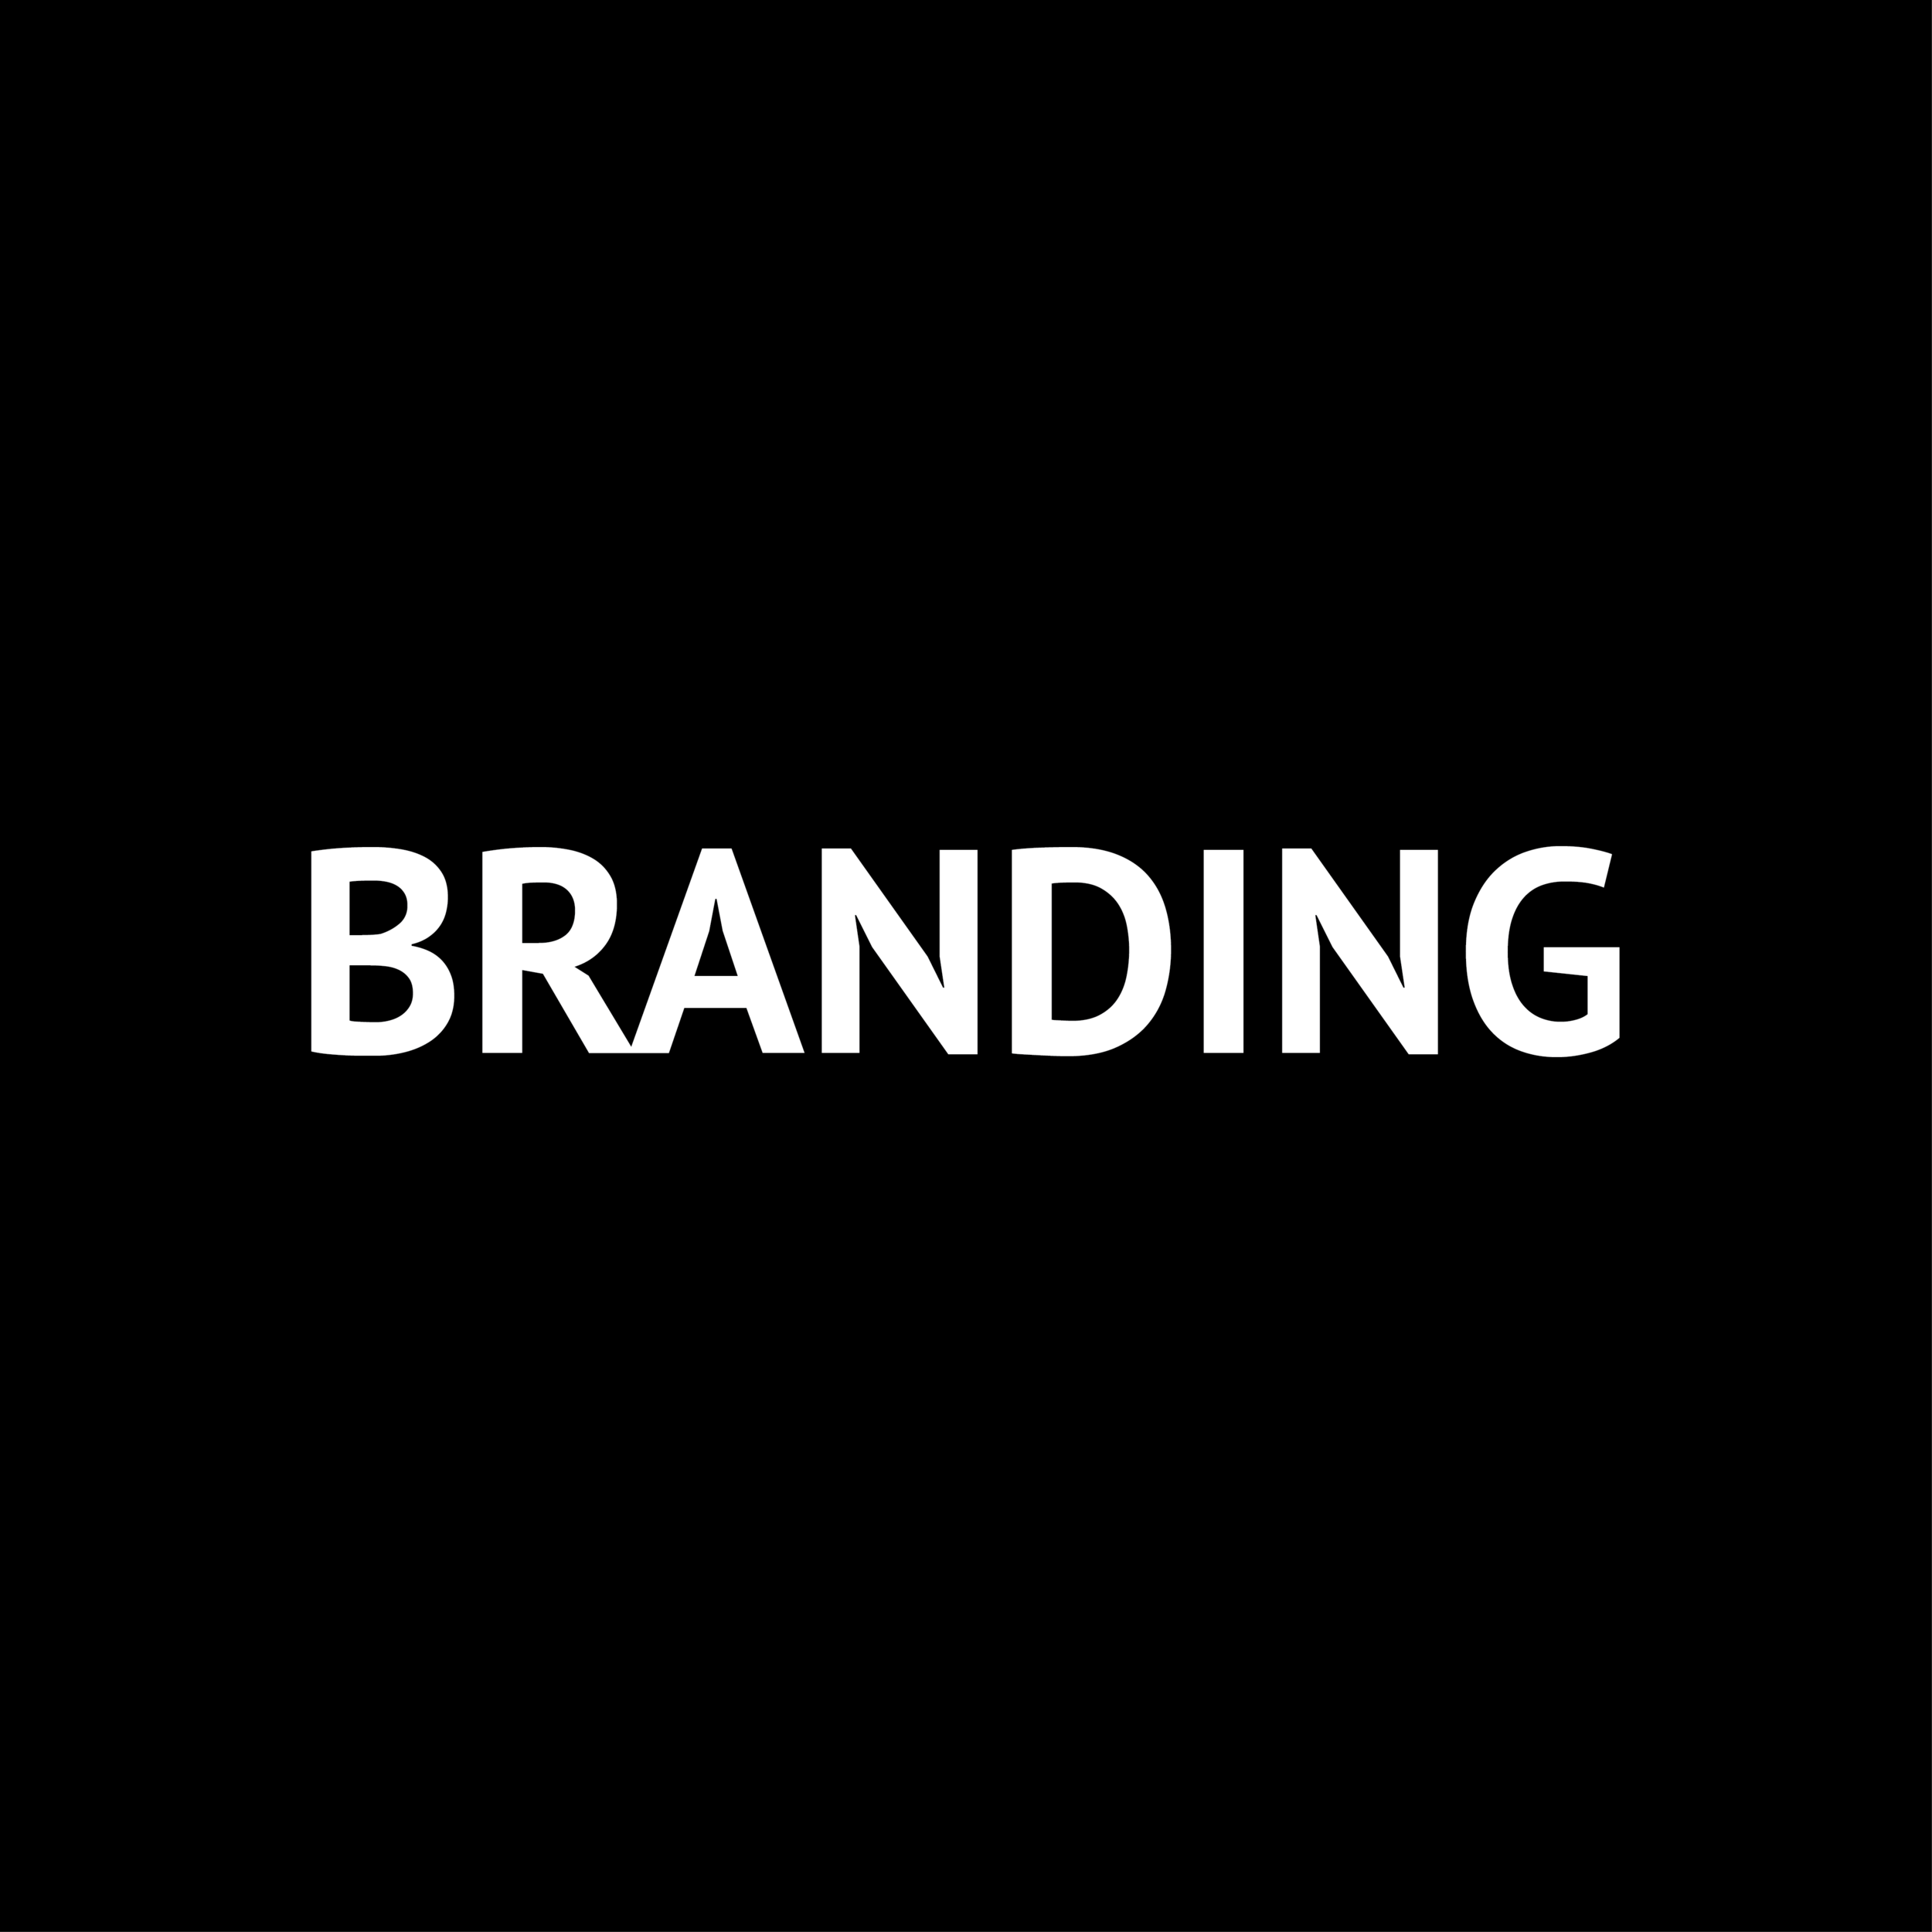 BRANDING  | Bre.